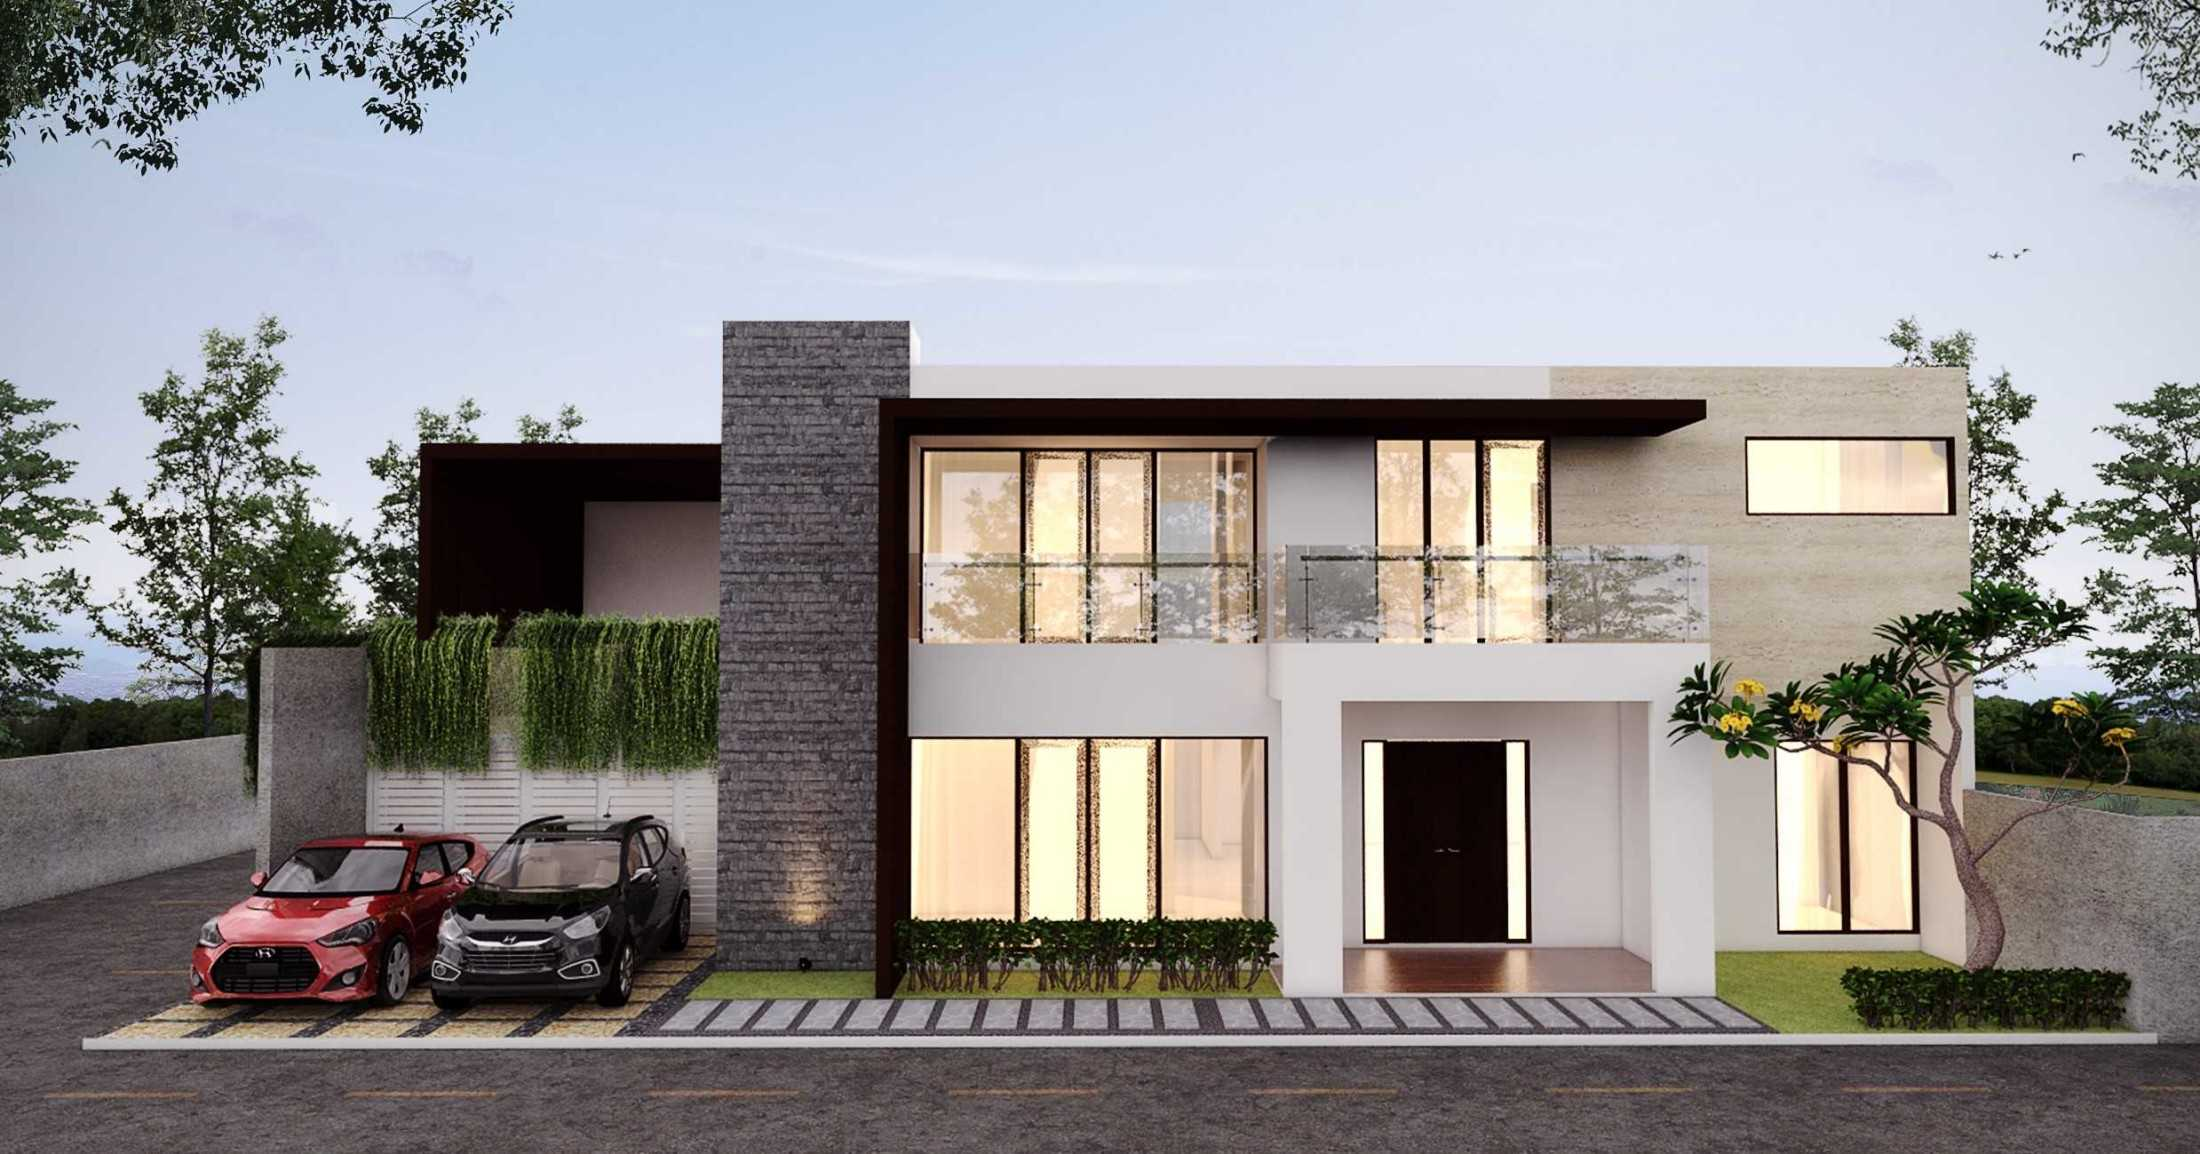 Sabio Design di Bali